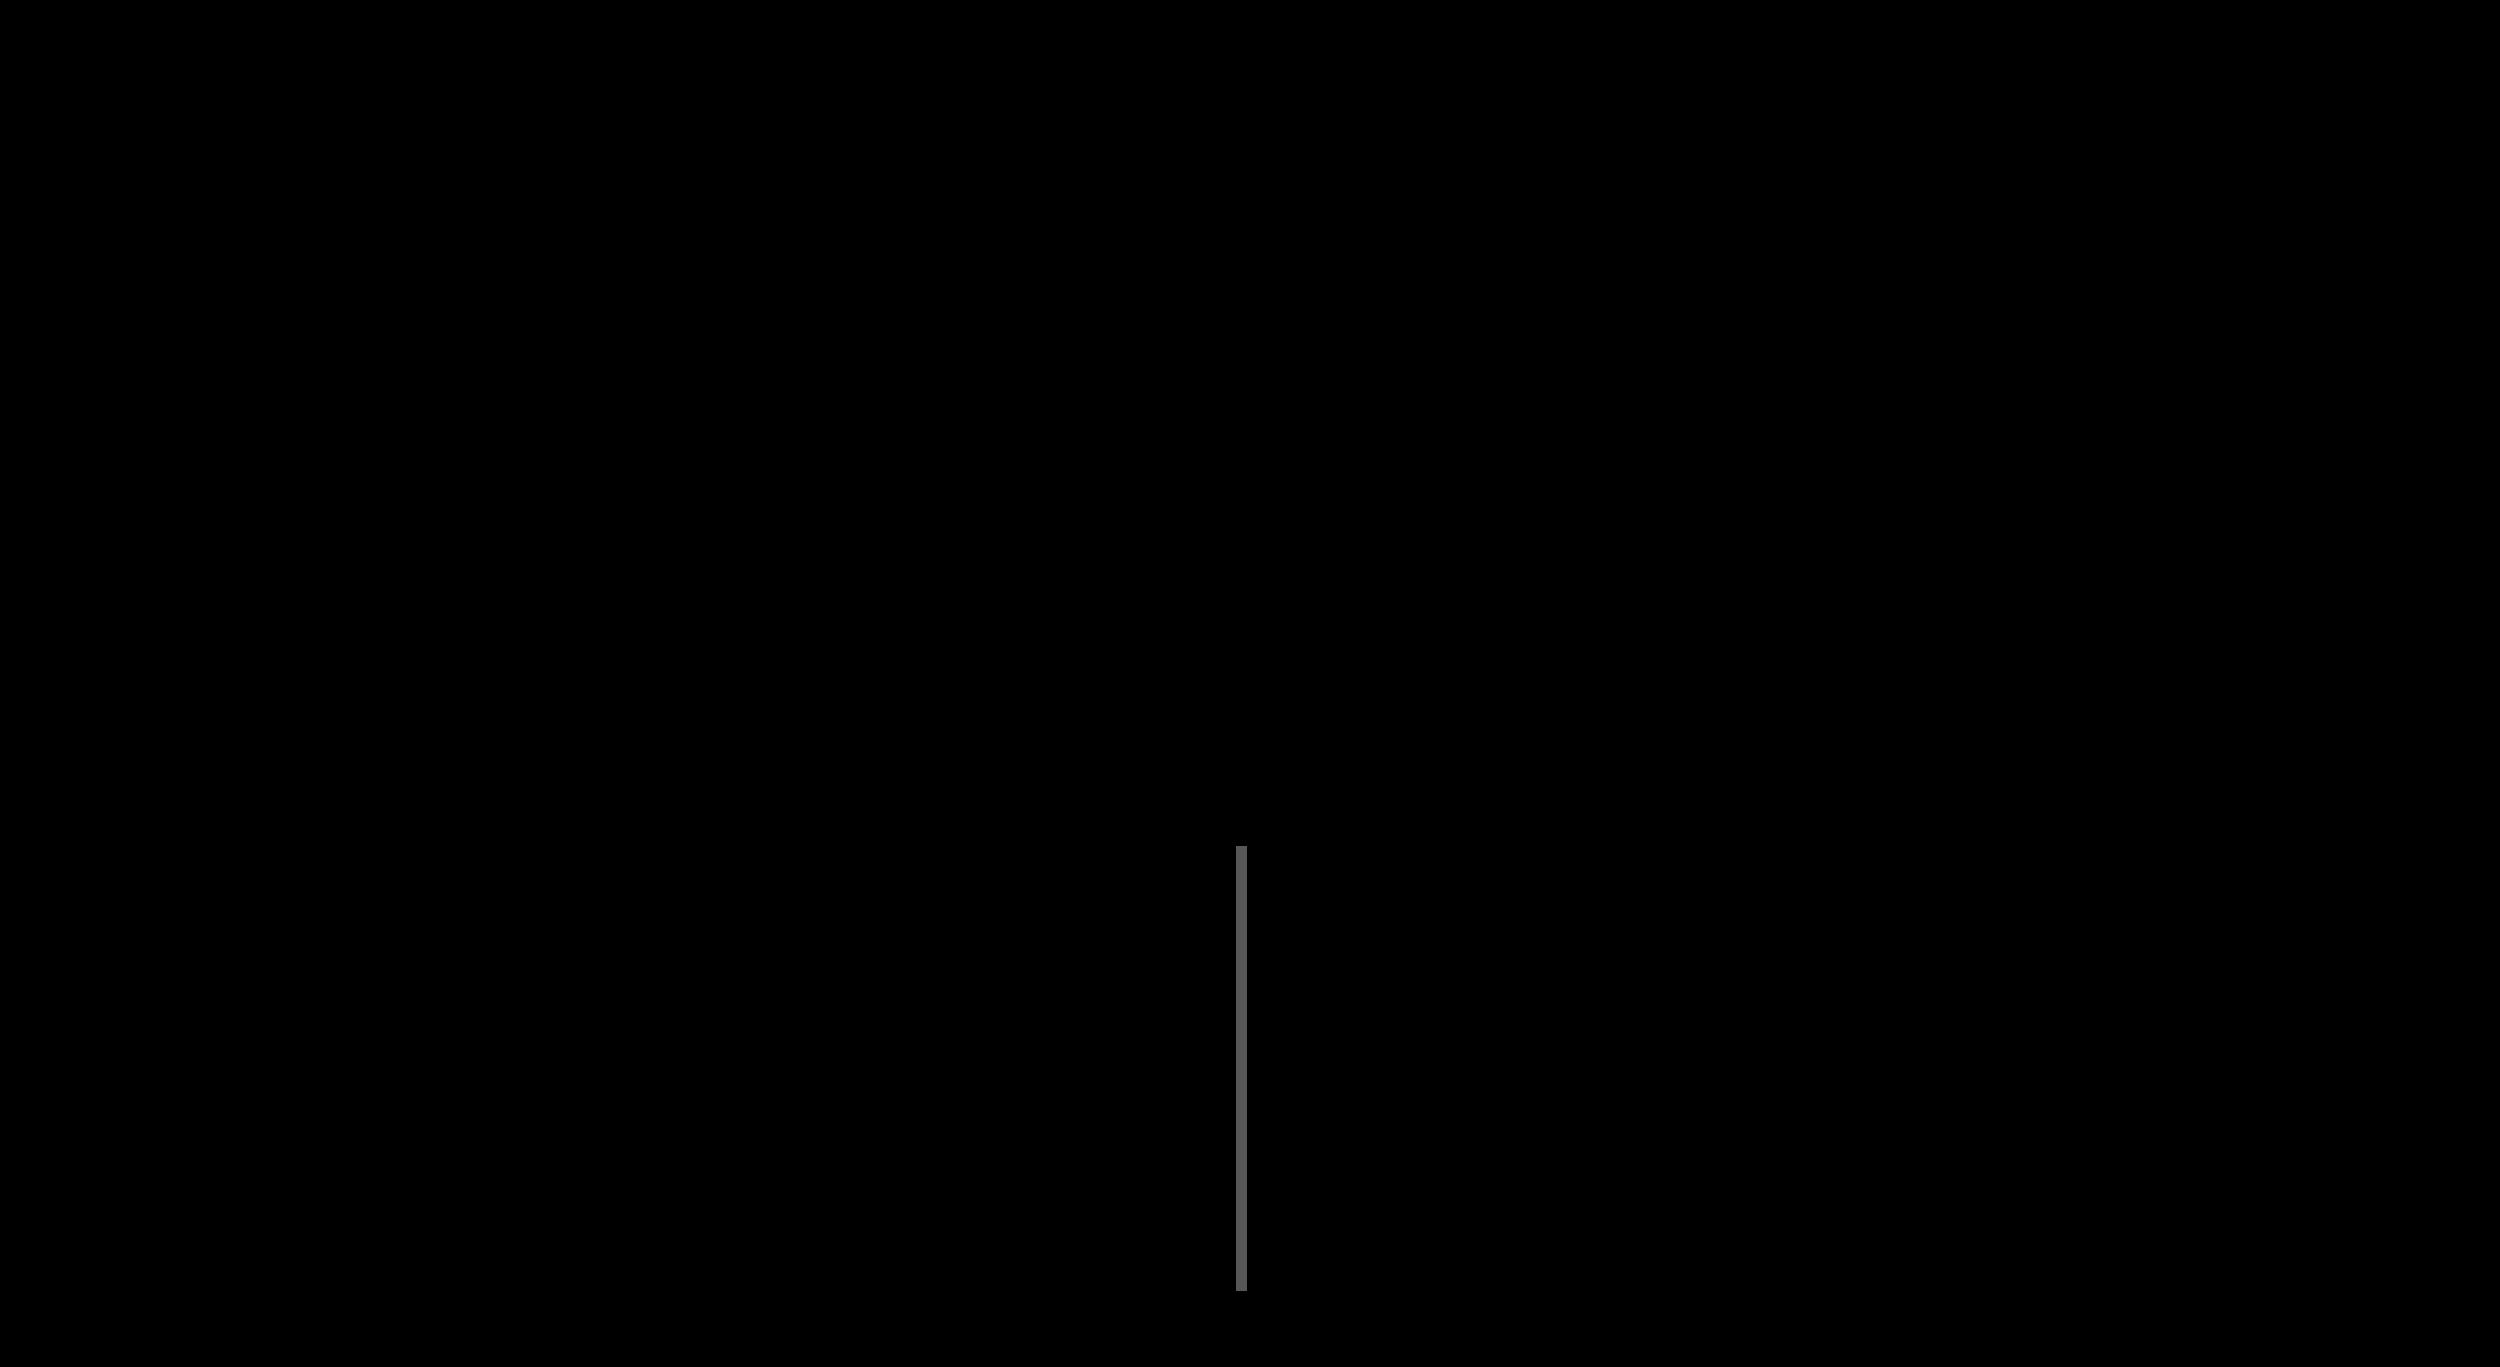 mfm-black-txt_transparent.png